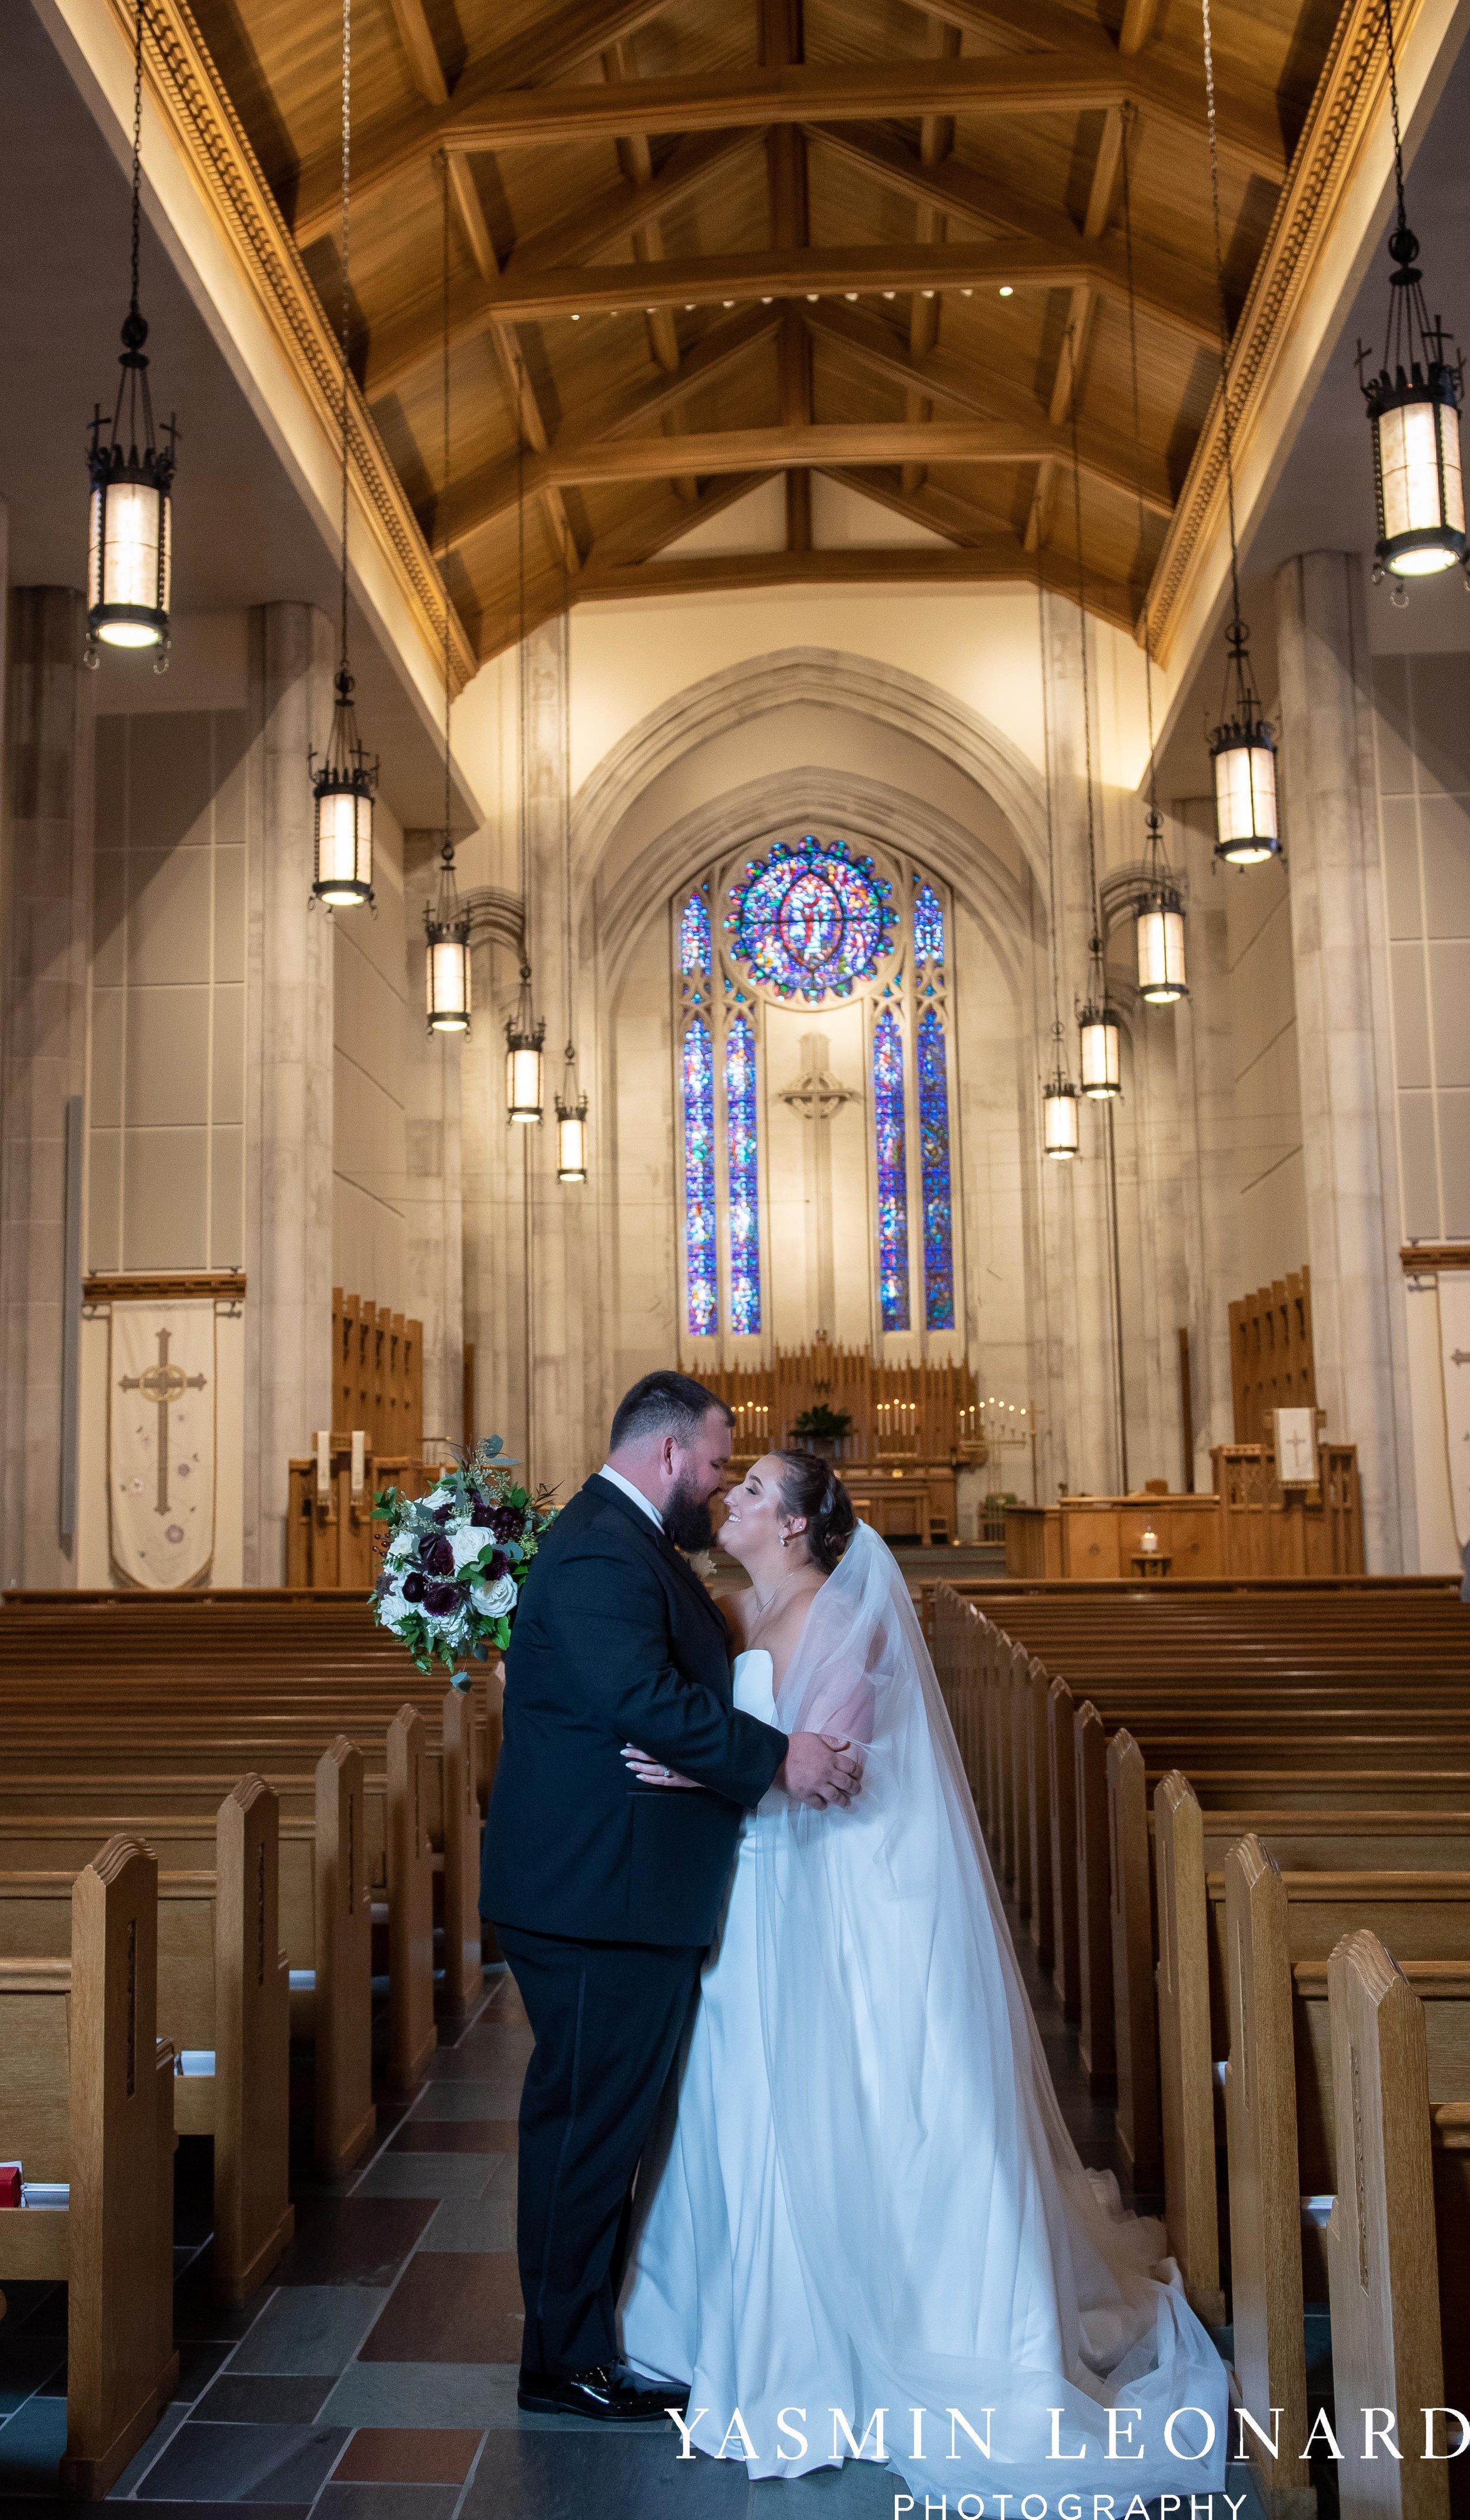 Wesley Memorial United Methodist Church - Old Homeplace Winery - High Point Weddings - High Point Wedding Photographer - NC Weddings - NC Barn Venue - Yasmin Leonard Photography-27.jpg